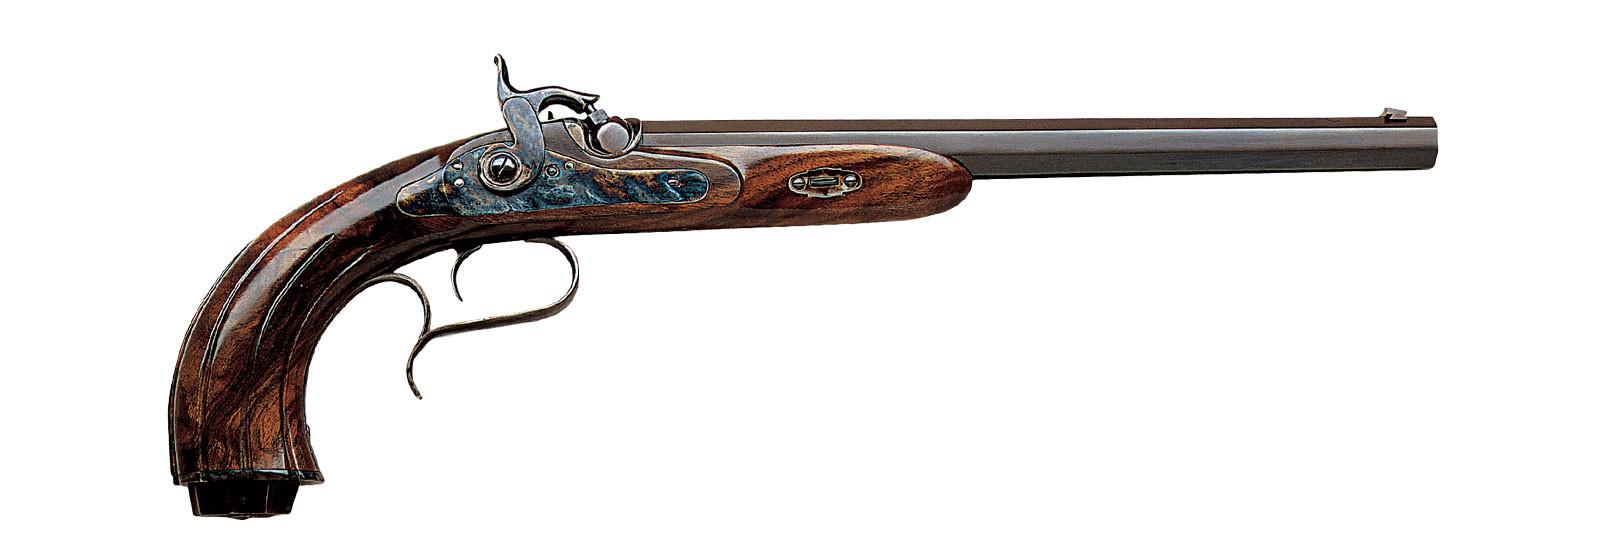 Pistola Kuchenreuter